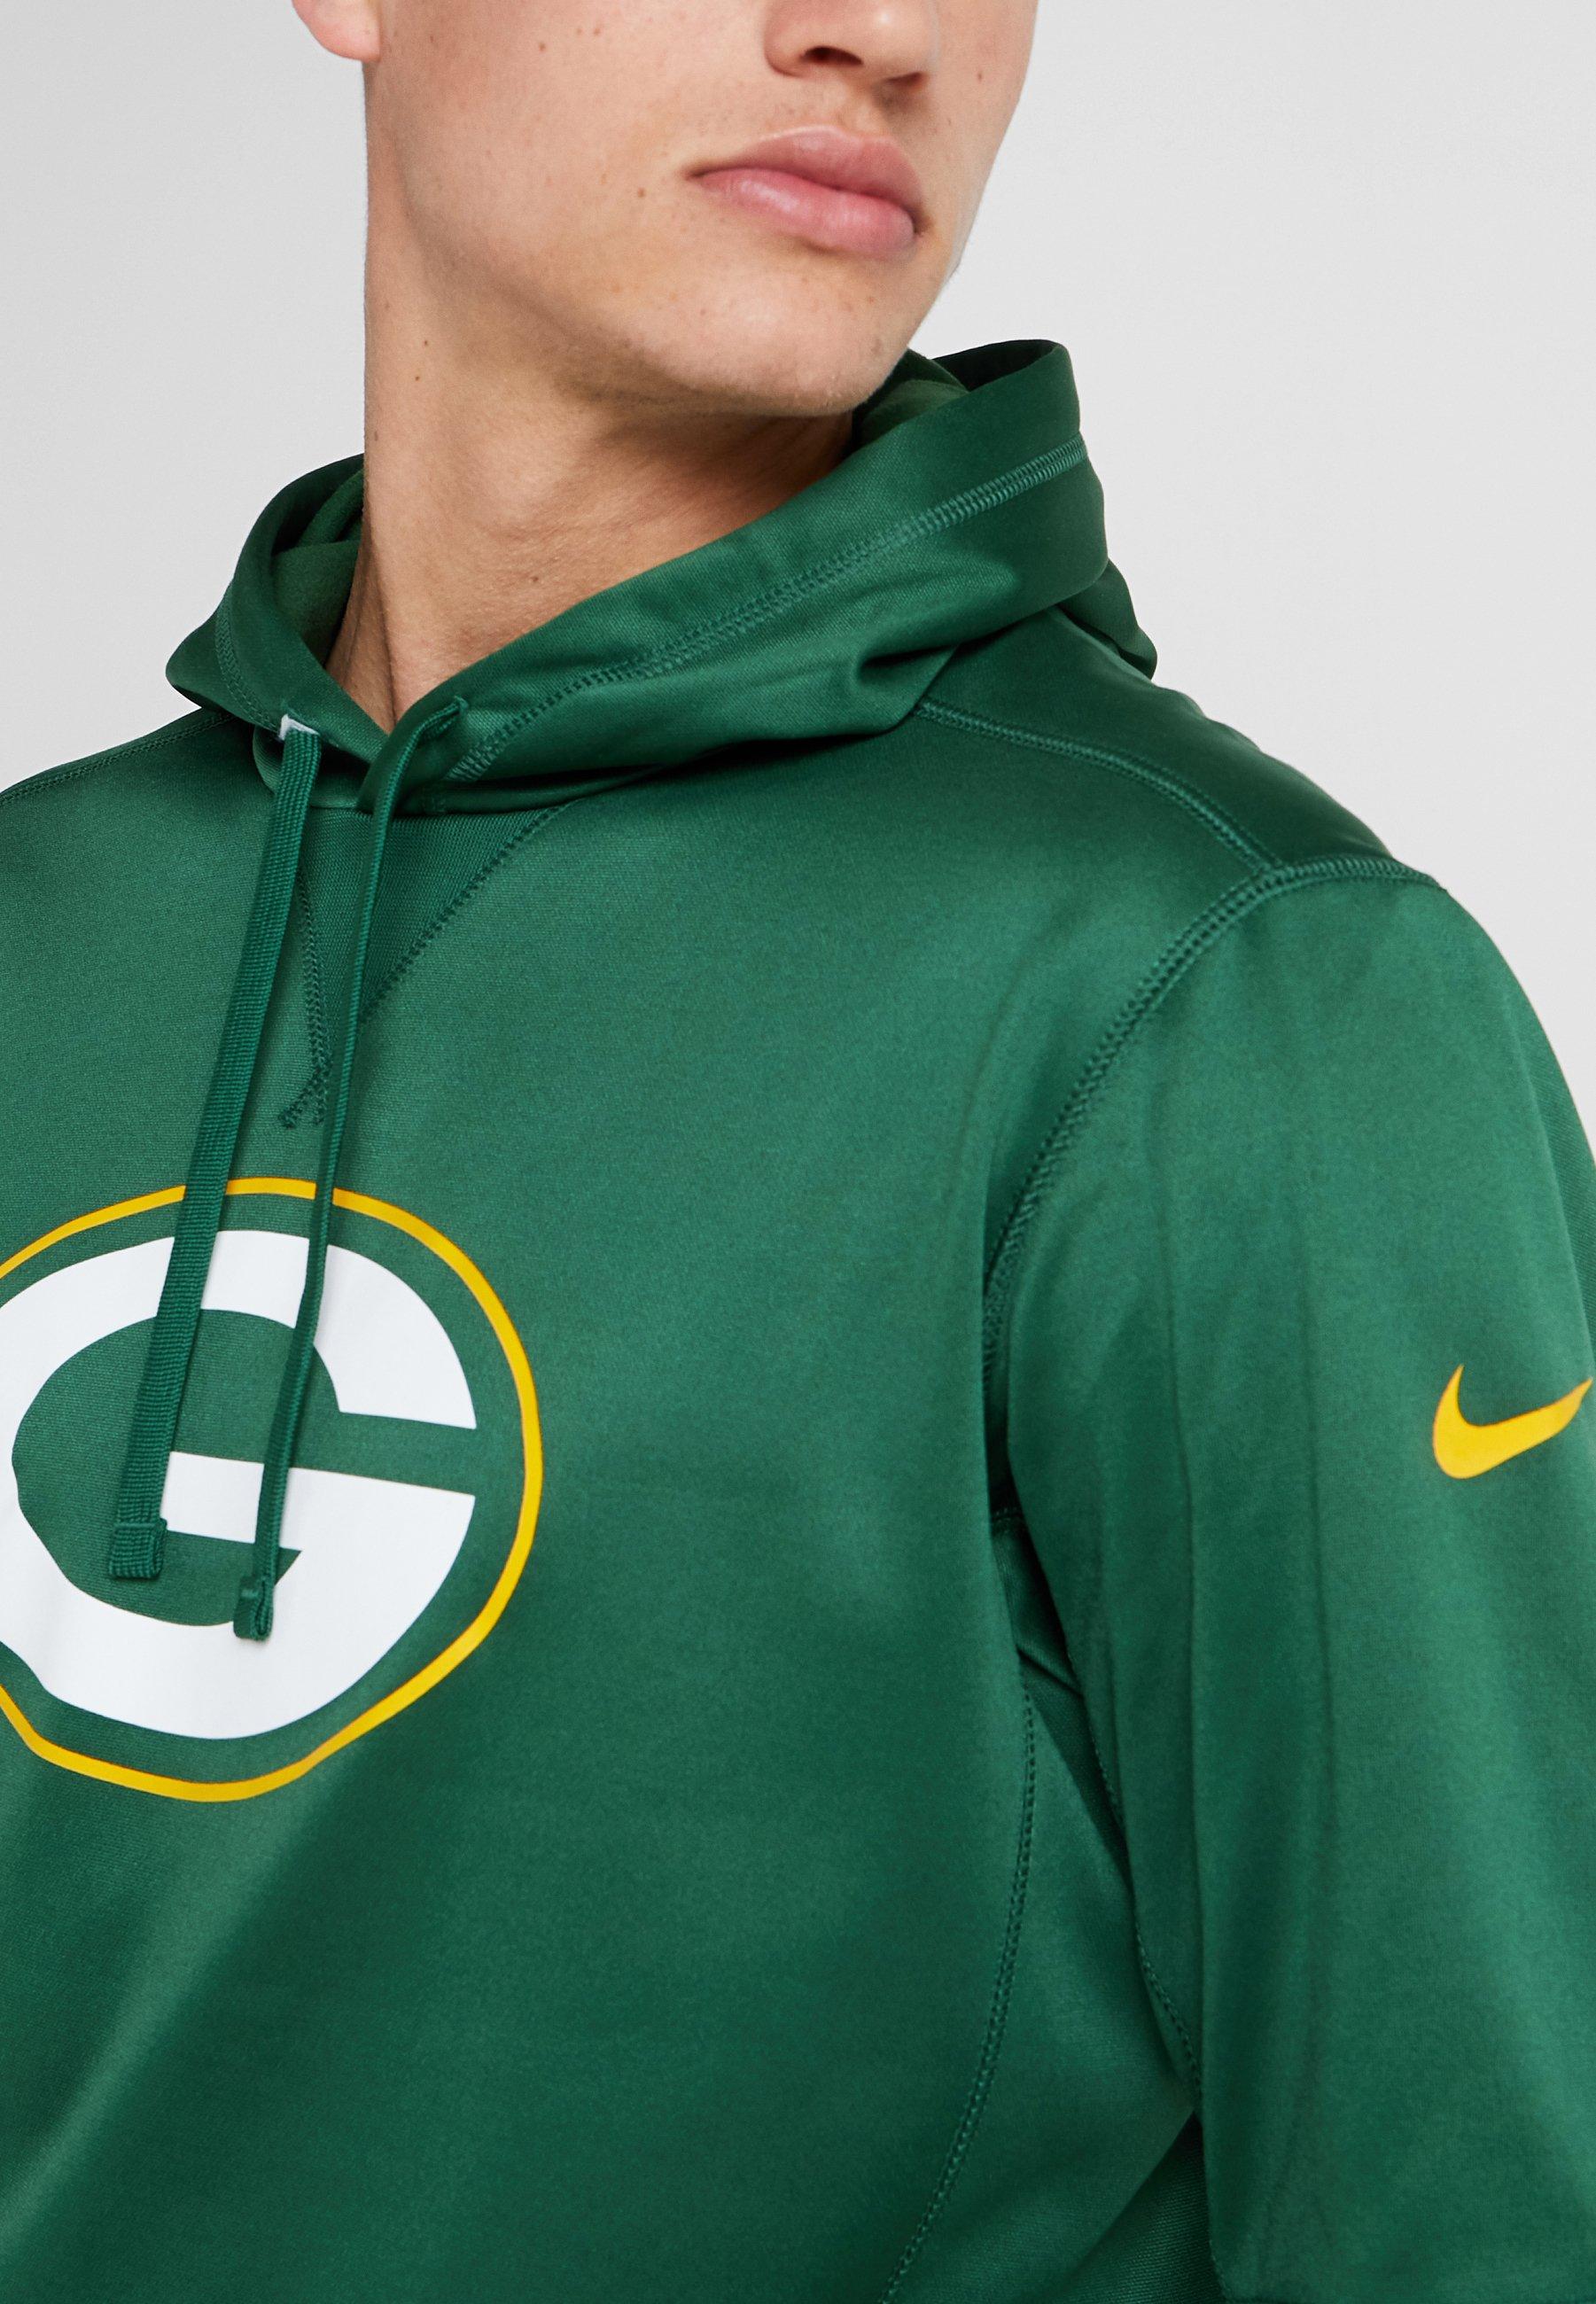 Nfl Gold Capuche Nike Logo Packers Fir university Bay HoodySweat À Performance WEIYH29eD